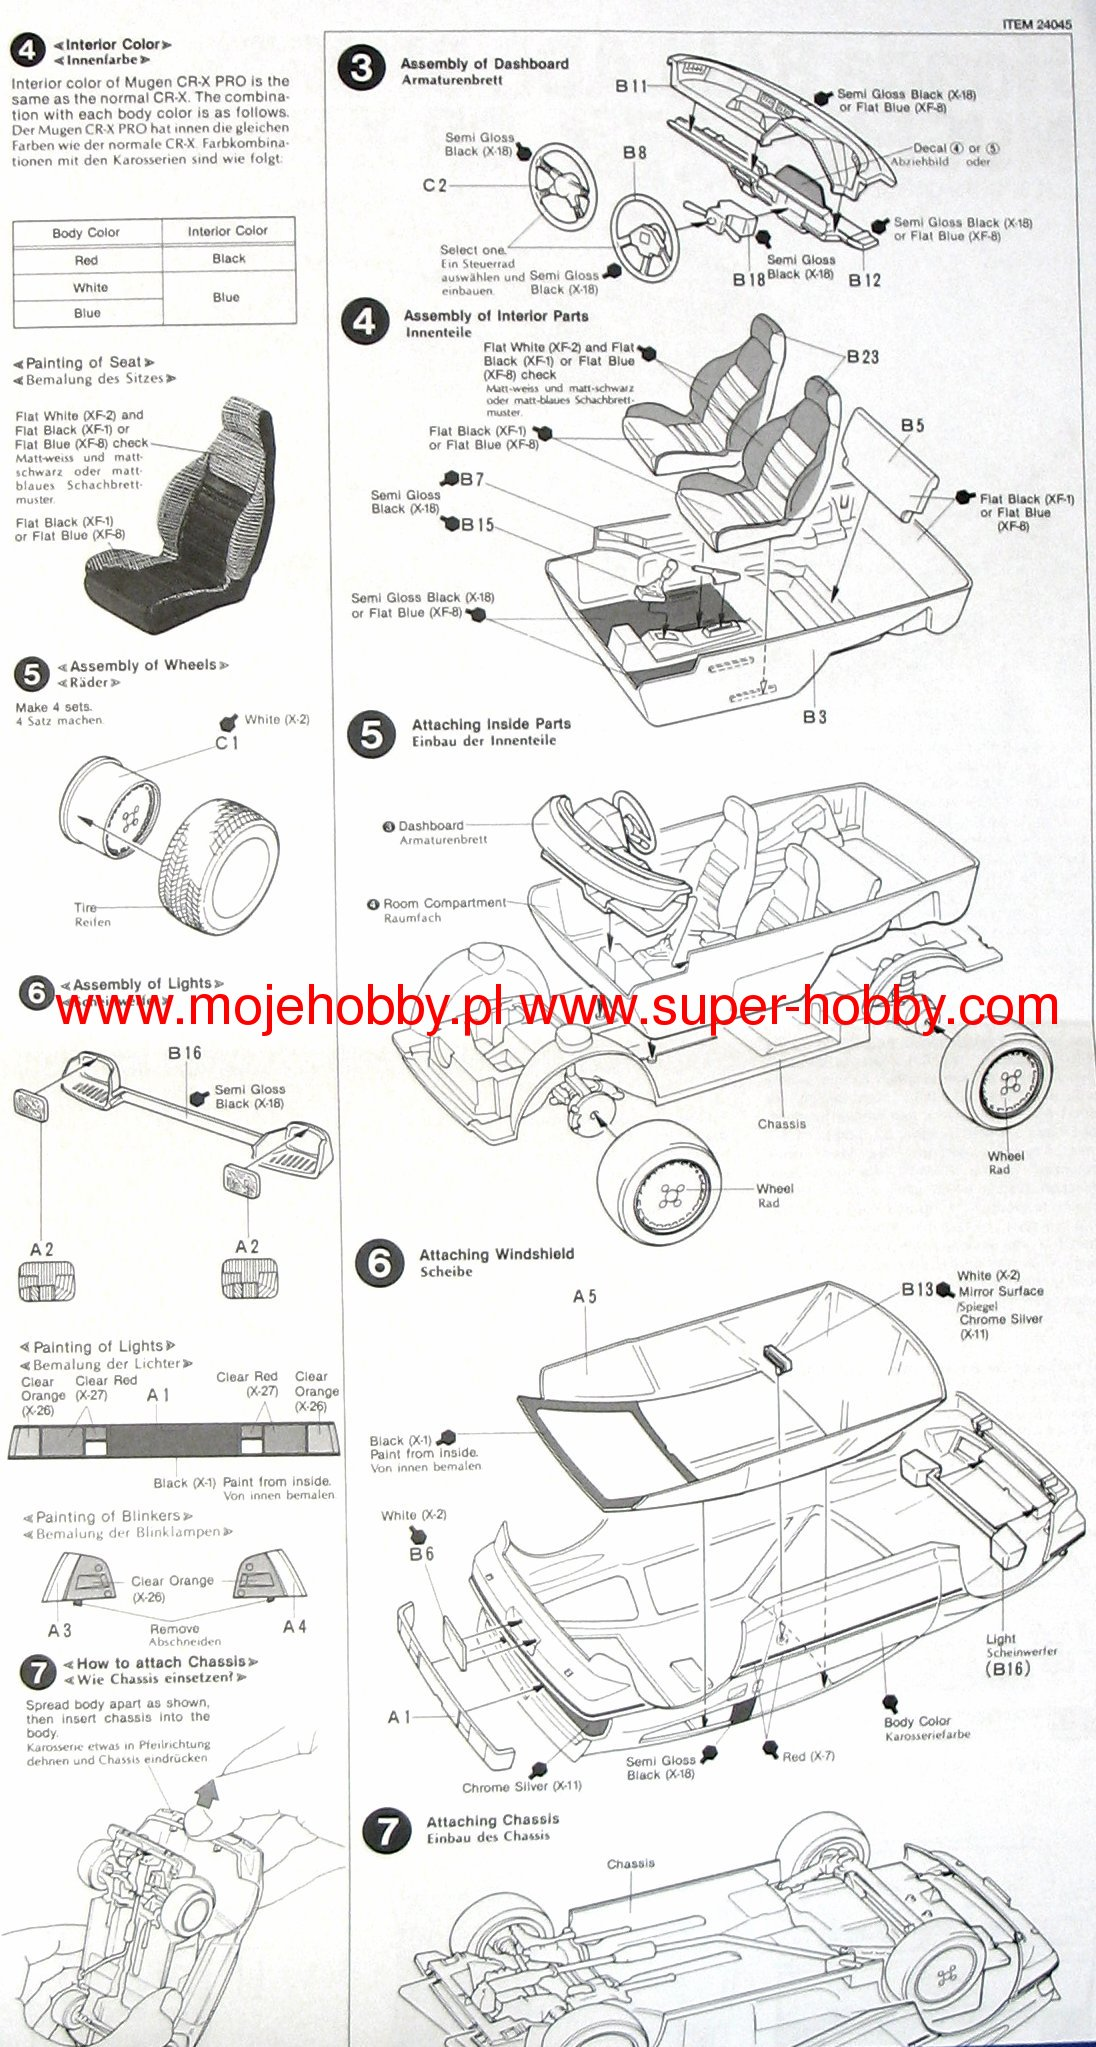 Brake Hydraulic Hose Nichirin 7 additionally Victor Gaskets G31056 Fuel Injection Throttle Body Mounting Gasket besides 152172143652 furthermore  likewise Honda Ballade Sports Mugen CR X Pro. on honda crx weight